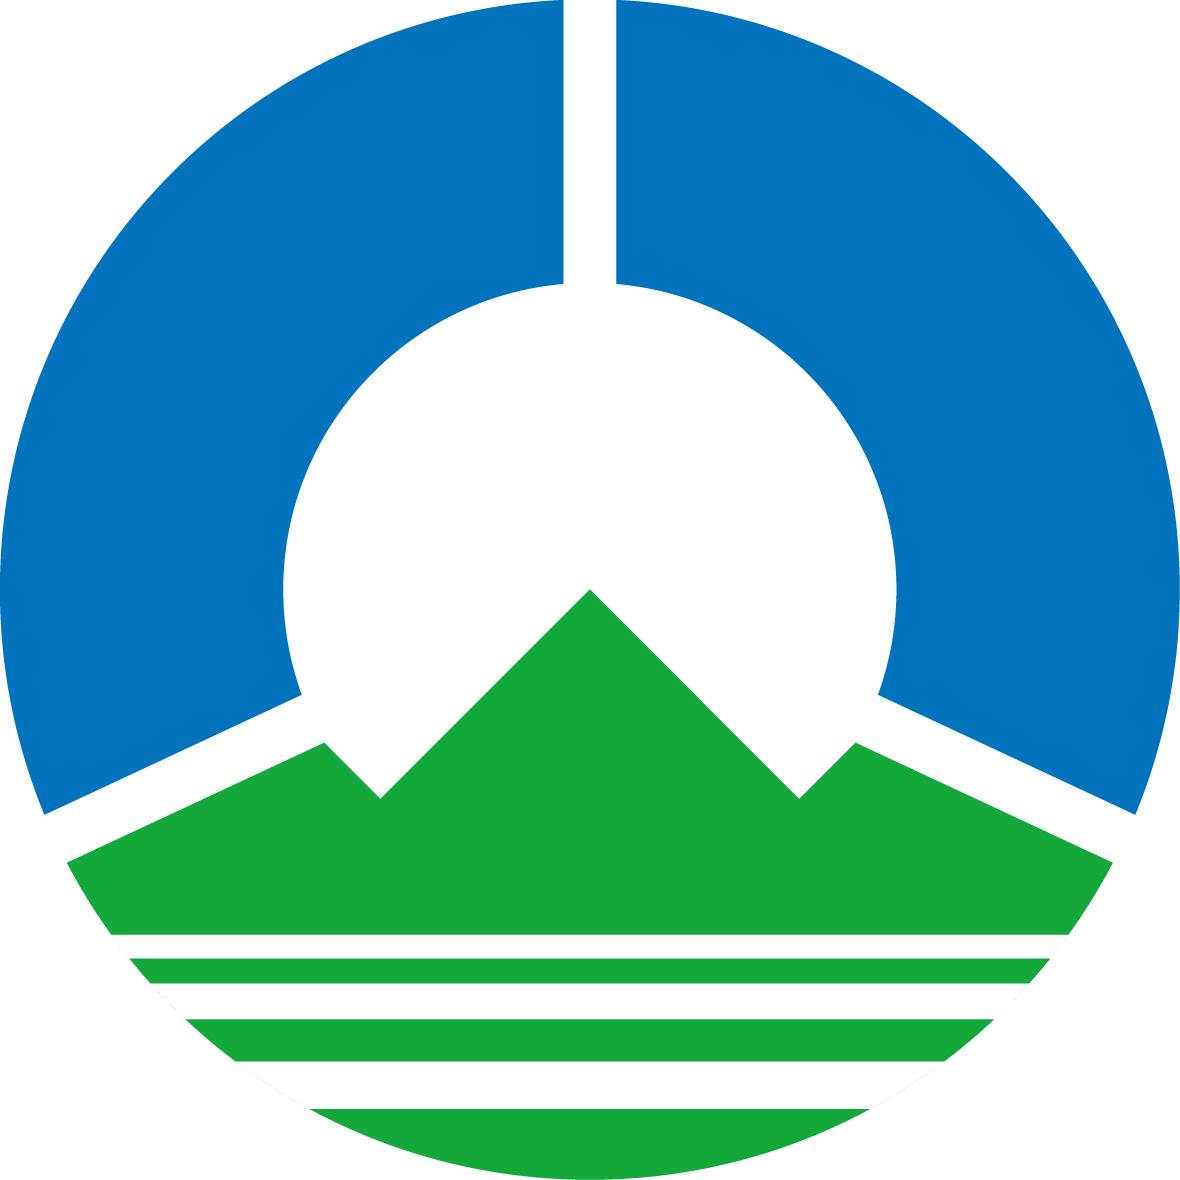 岩手県 八幡平市ロゴ